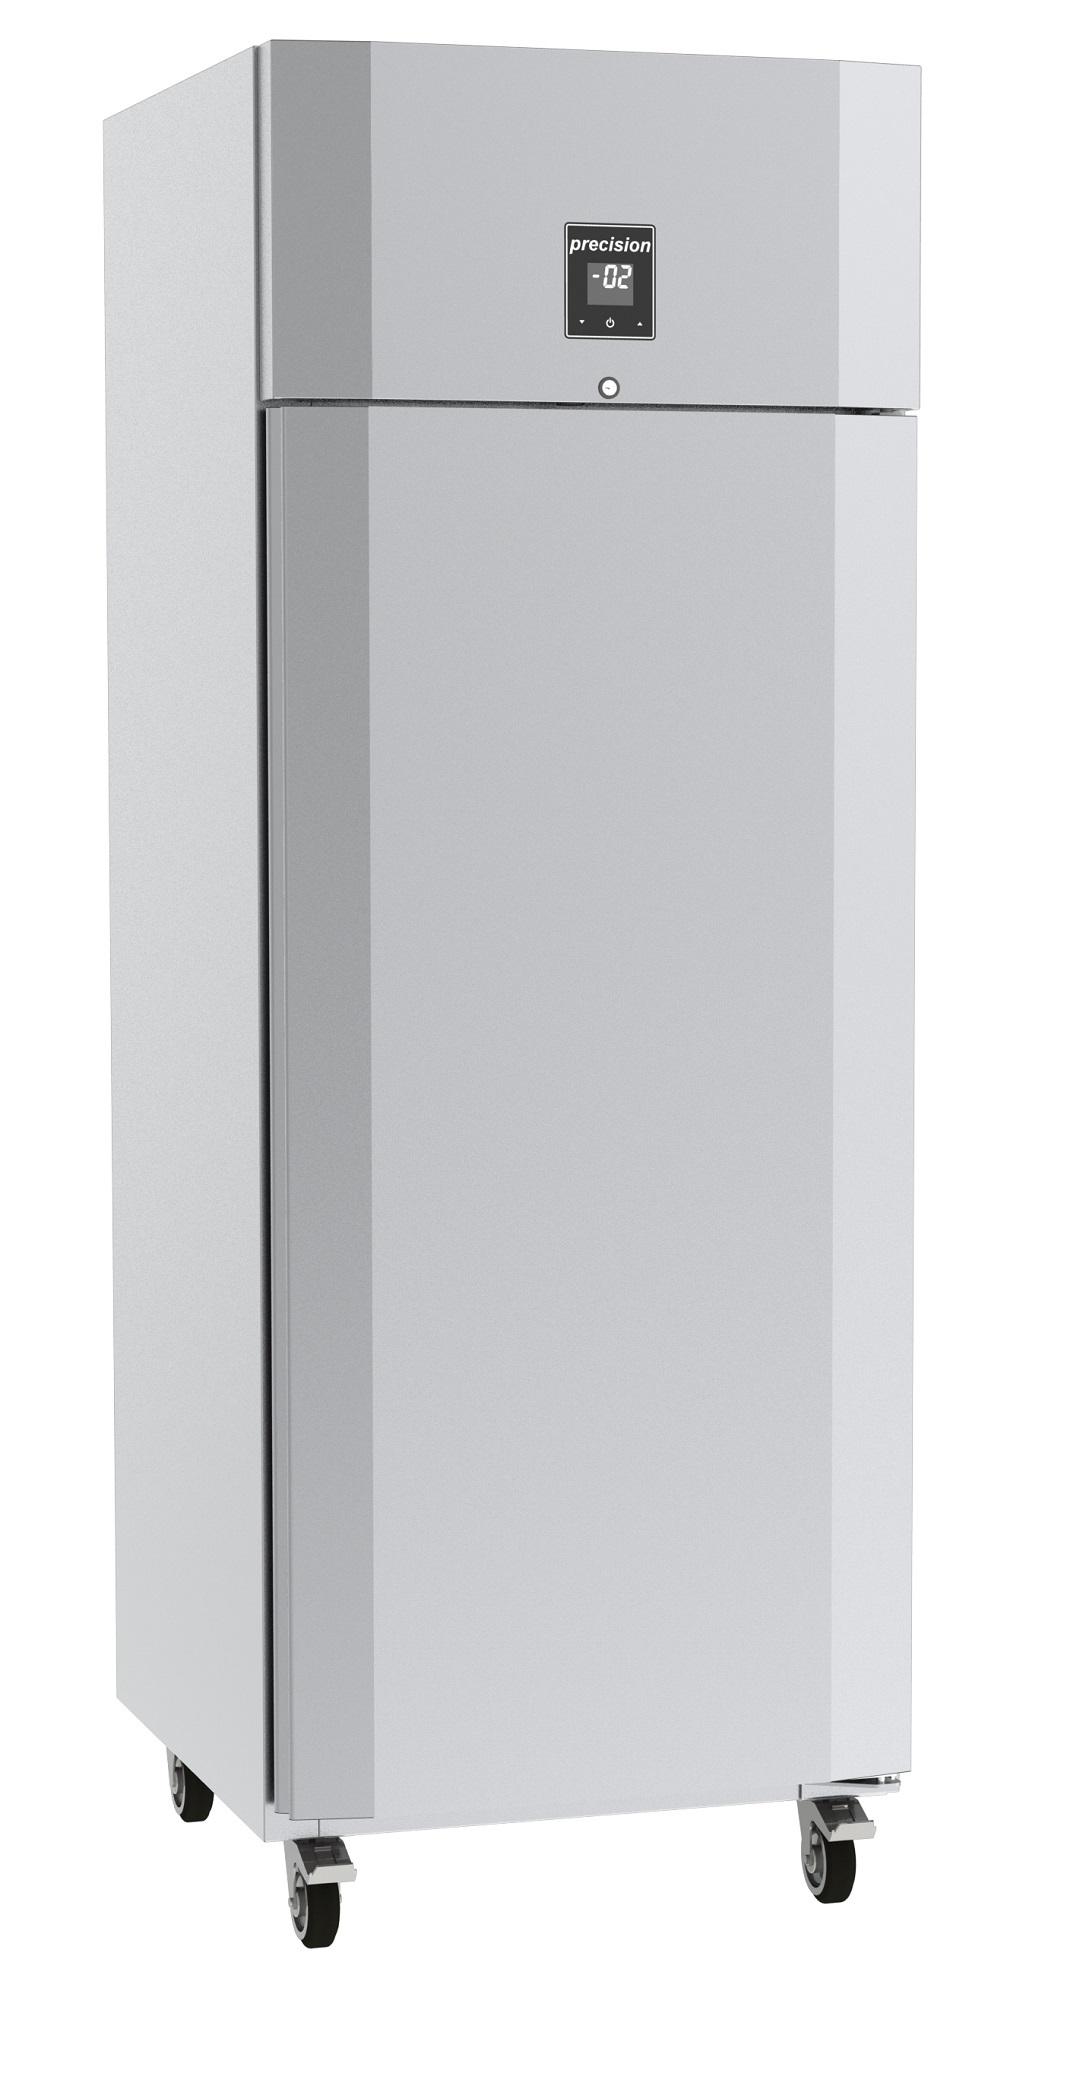 Precision Lpt 601 Ss Upright Gastronorm Freezer